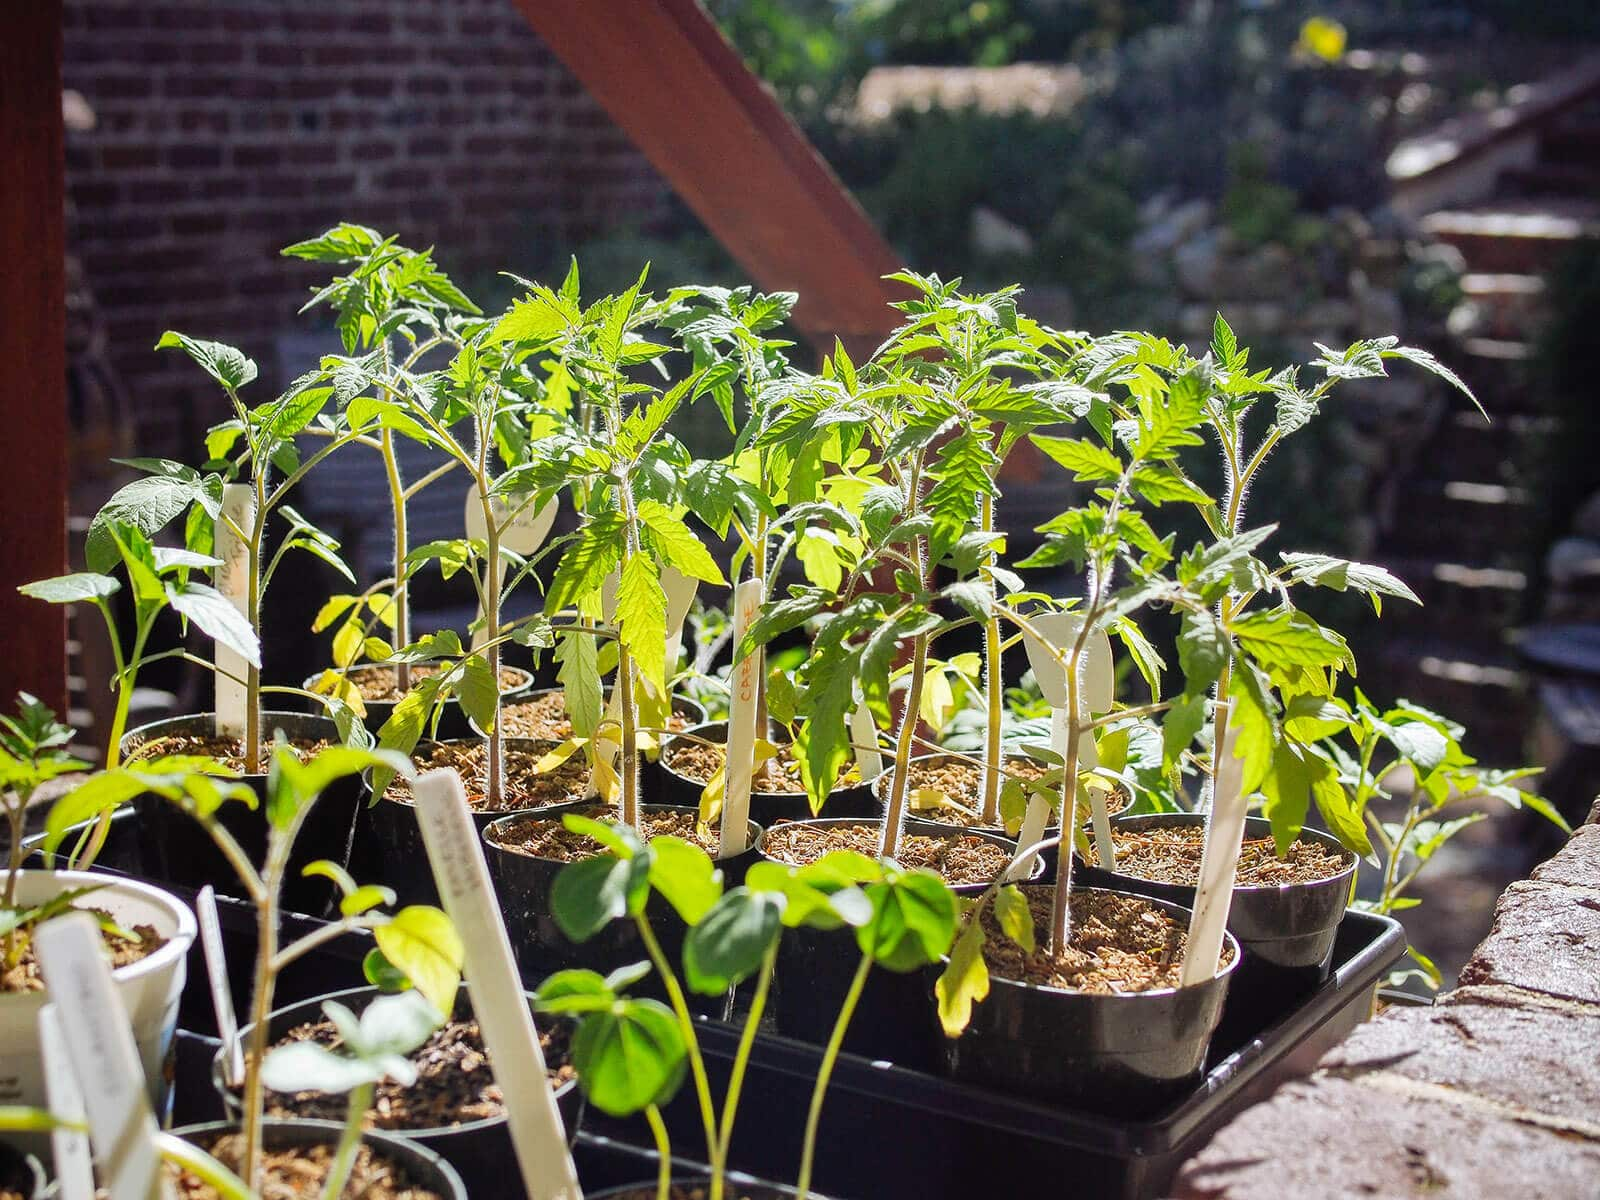 Hardening off tomato starts